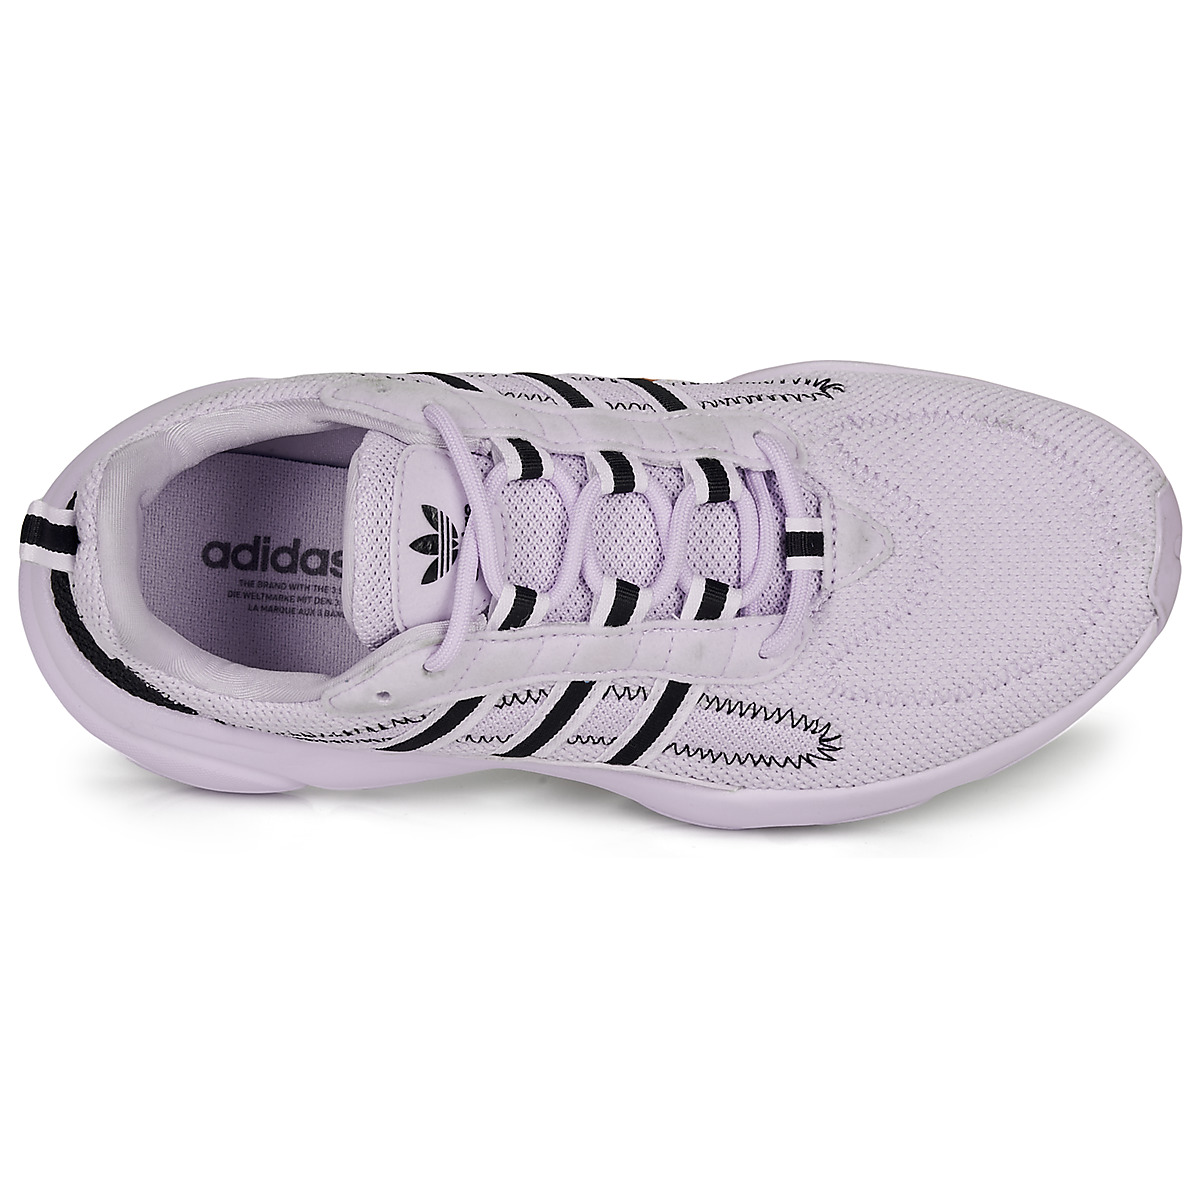 adidas donne chaussure gratuite